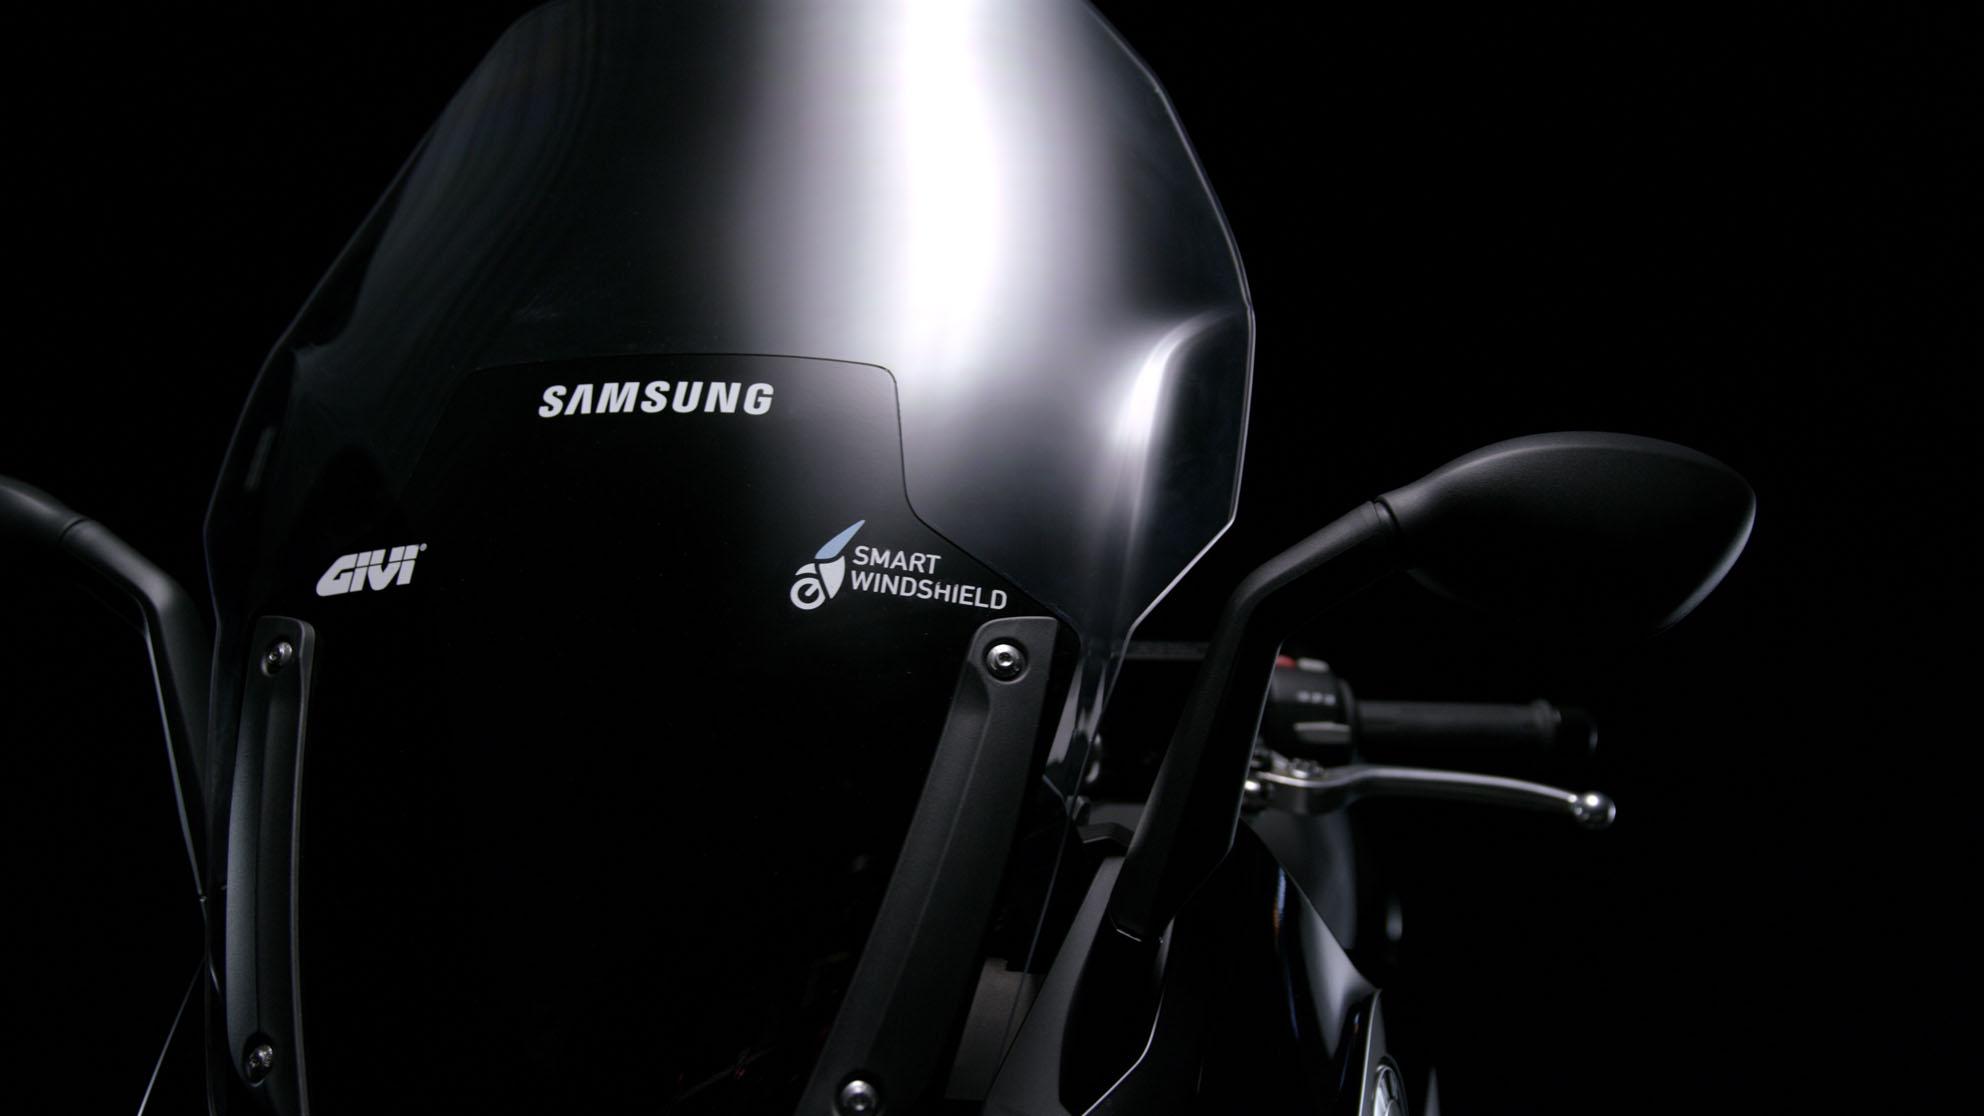 samsung-smart-windshield-apertura